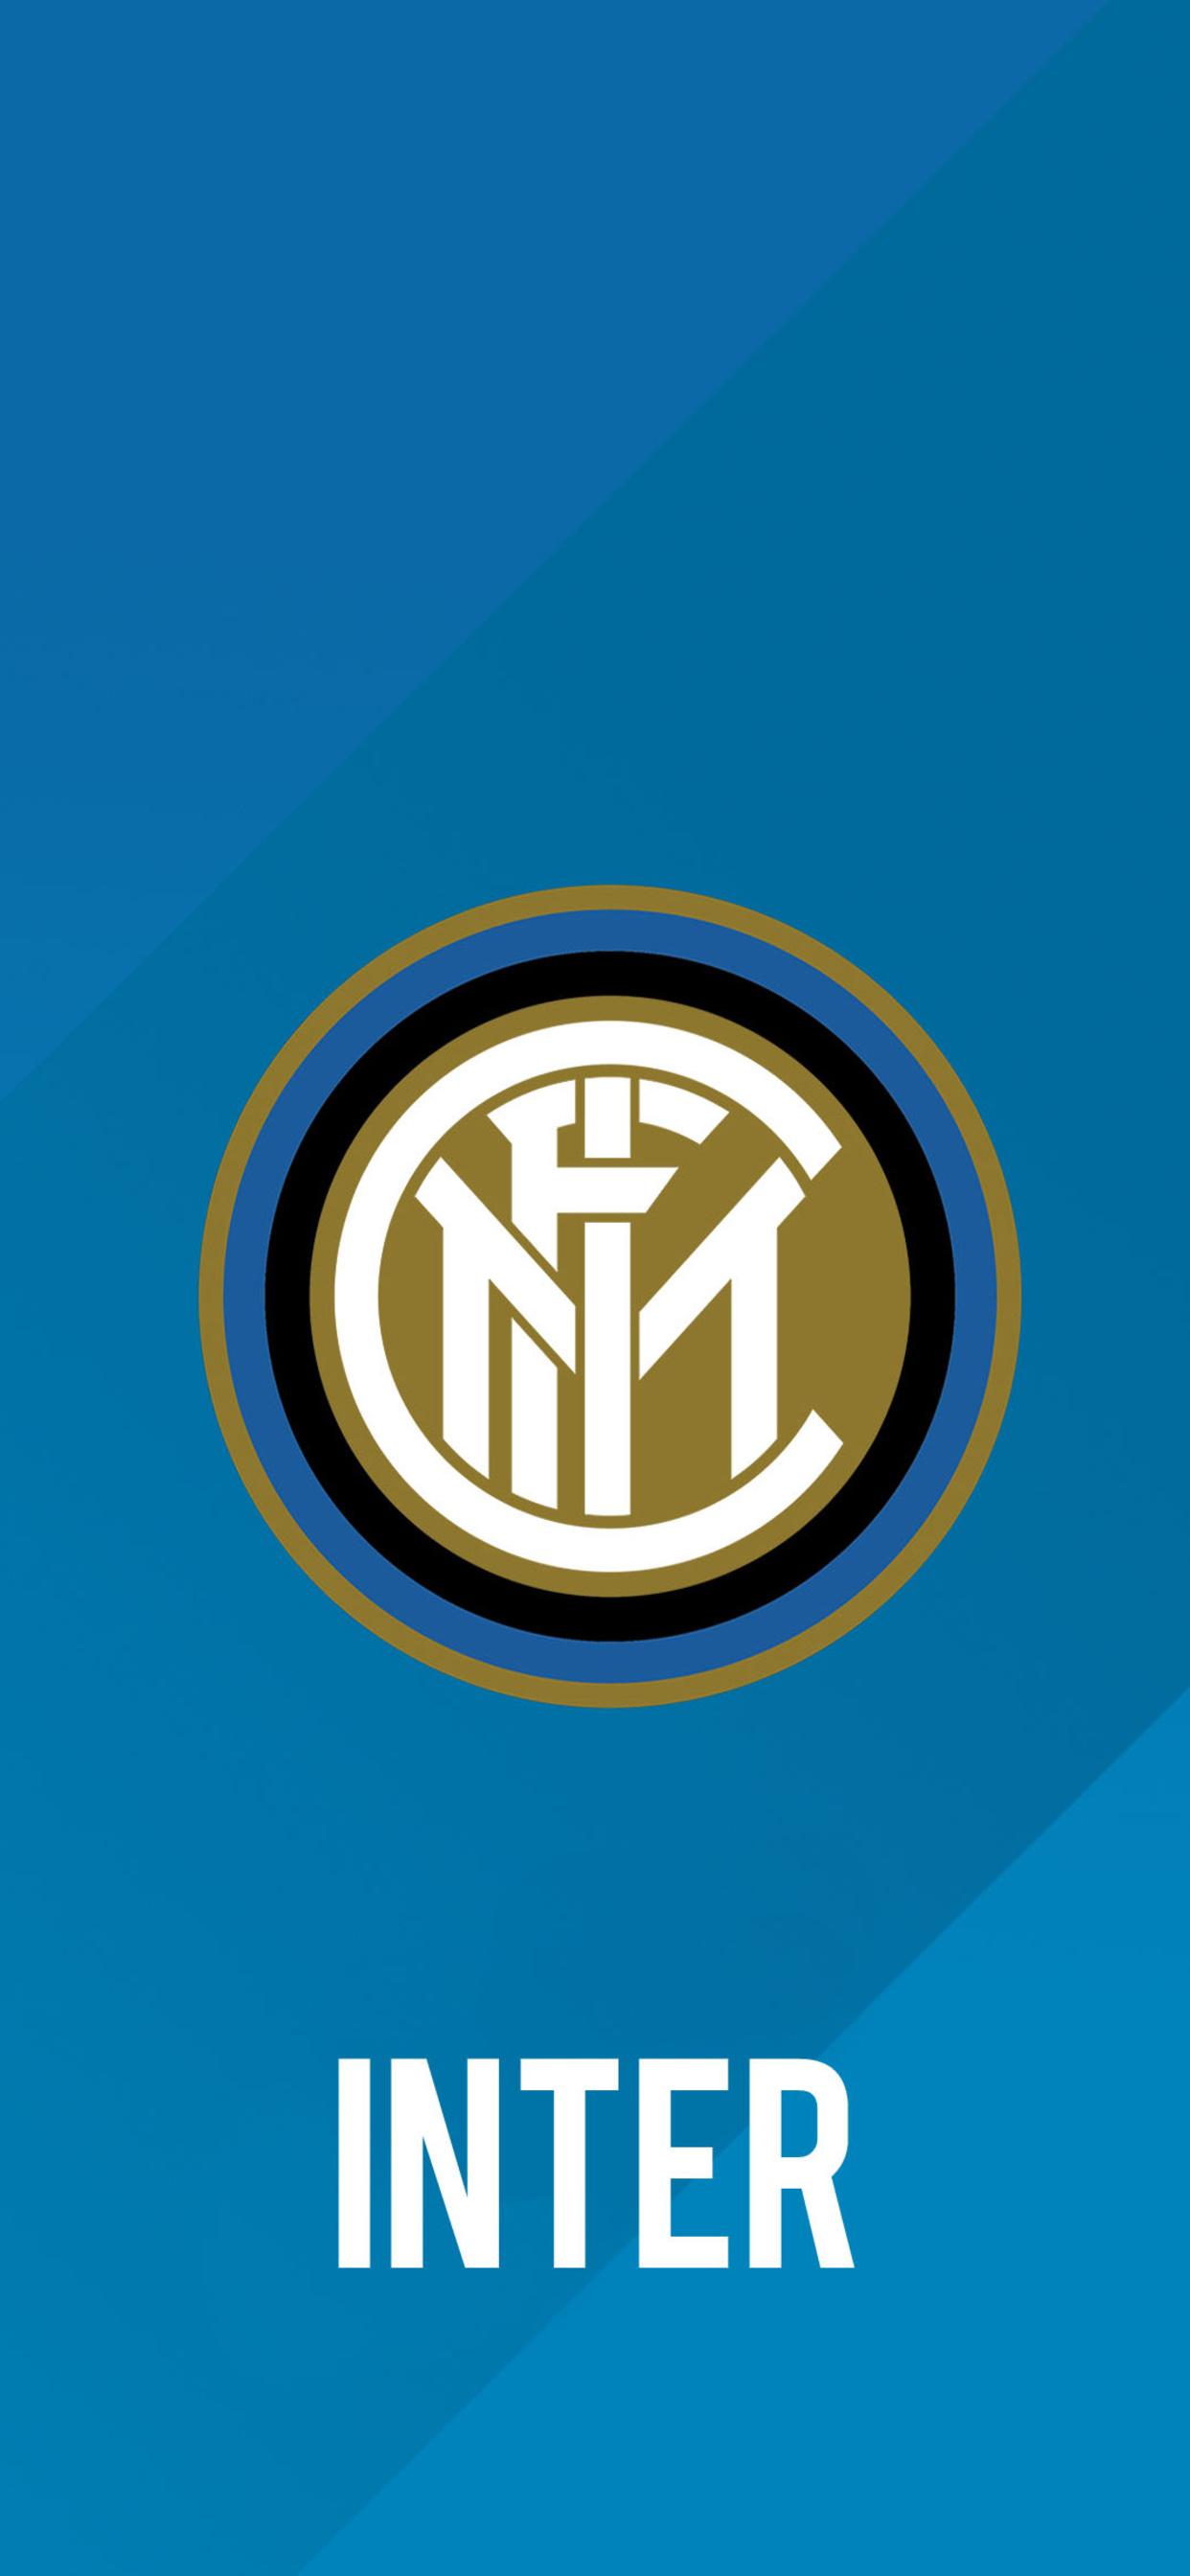 1242x2688 Inter Milan Football Club Logo Iphone Xs Max Hd 4k